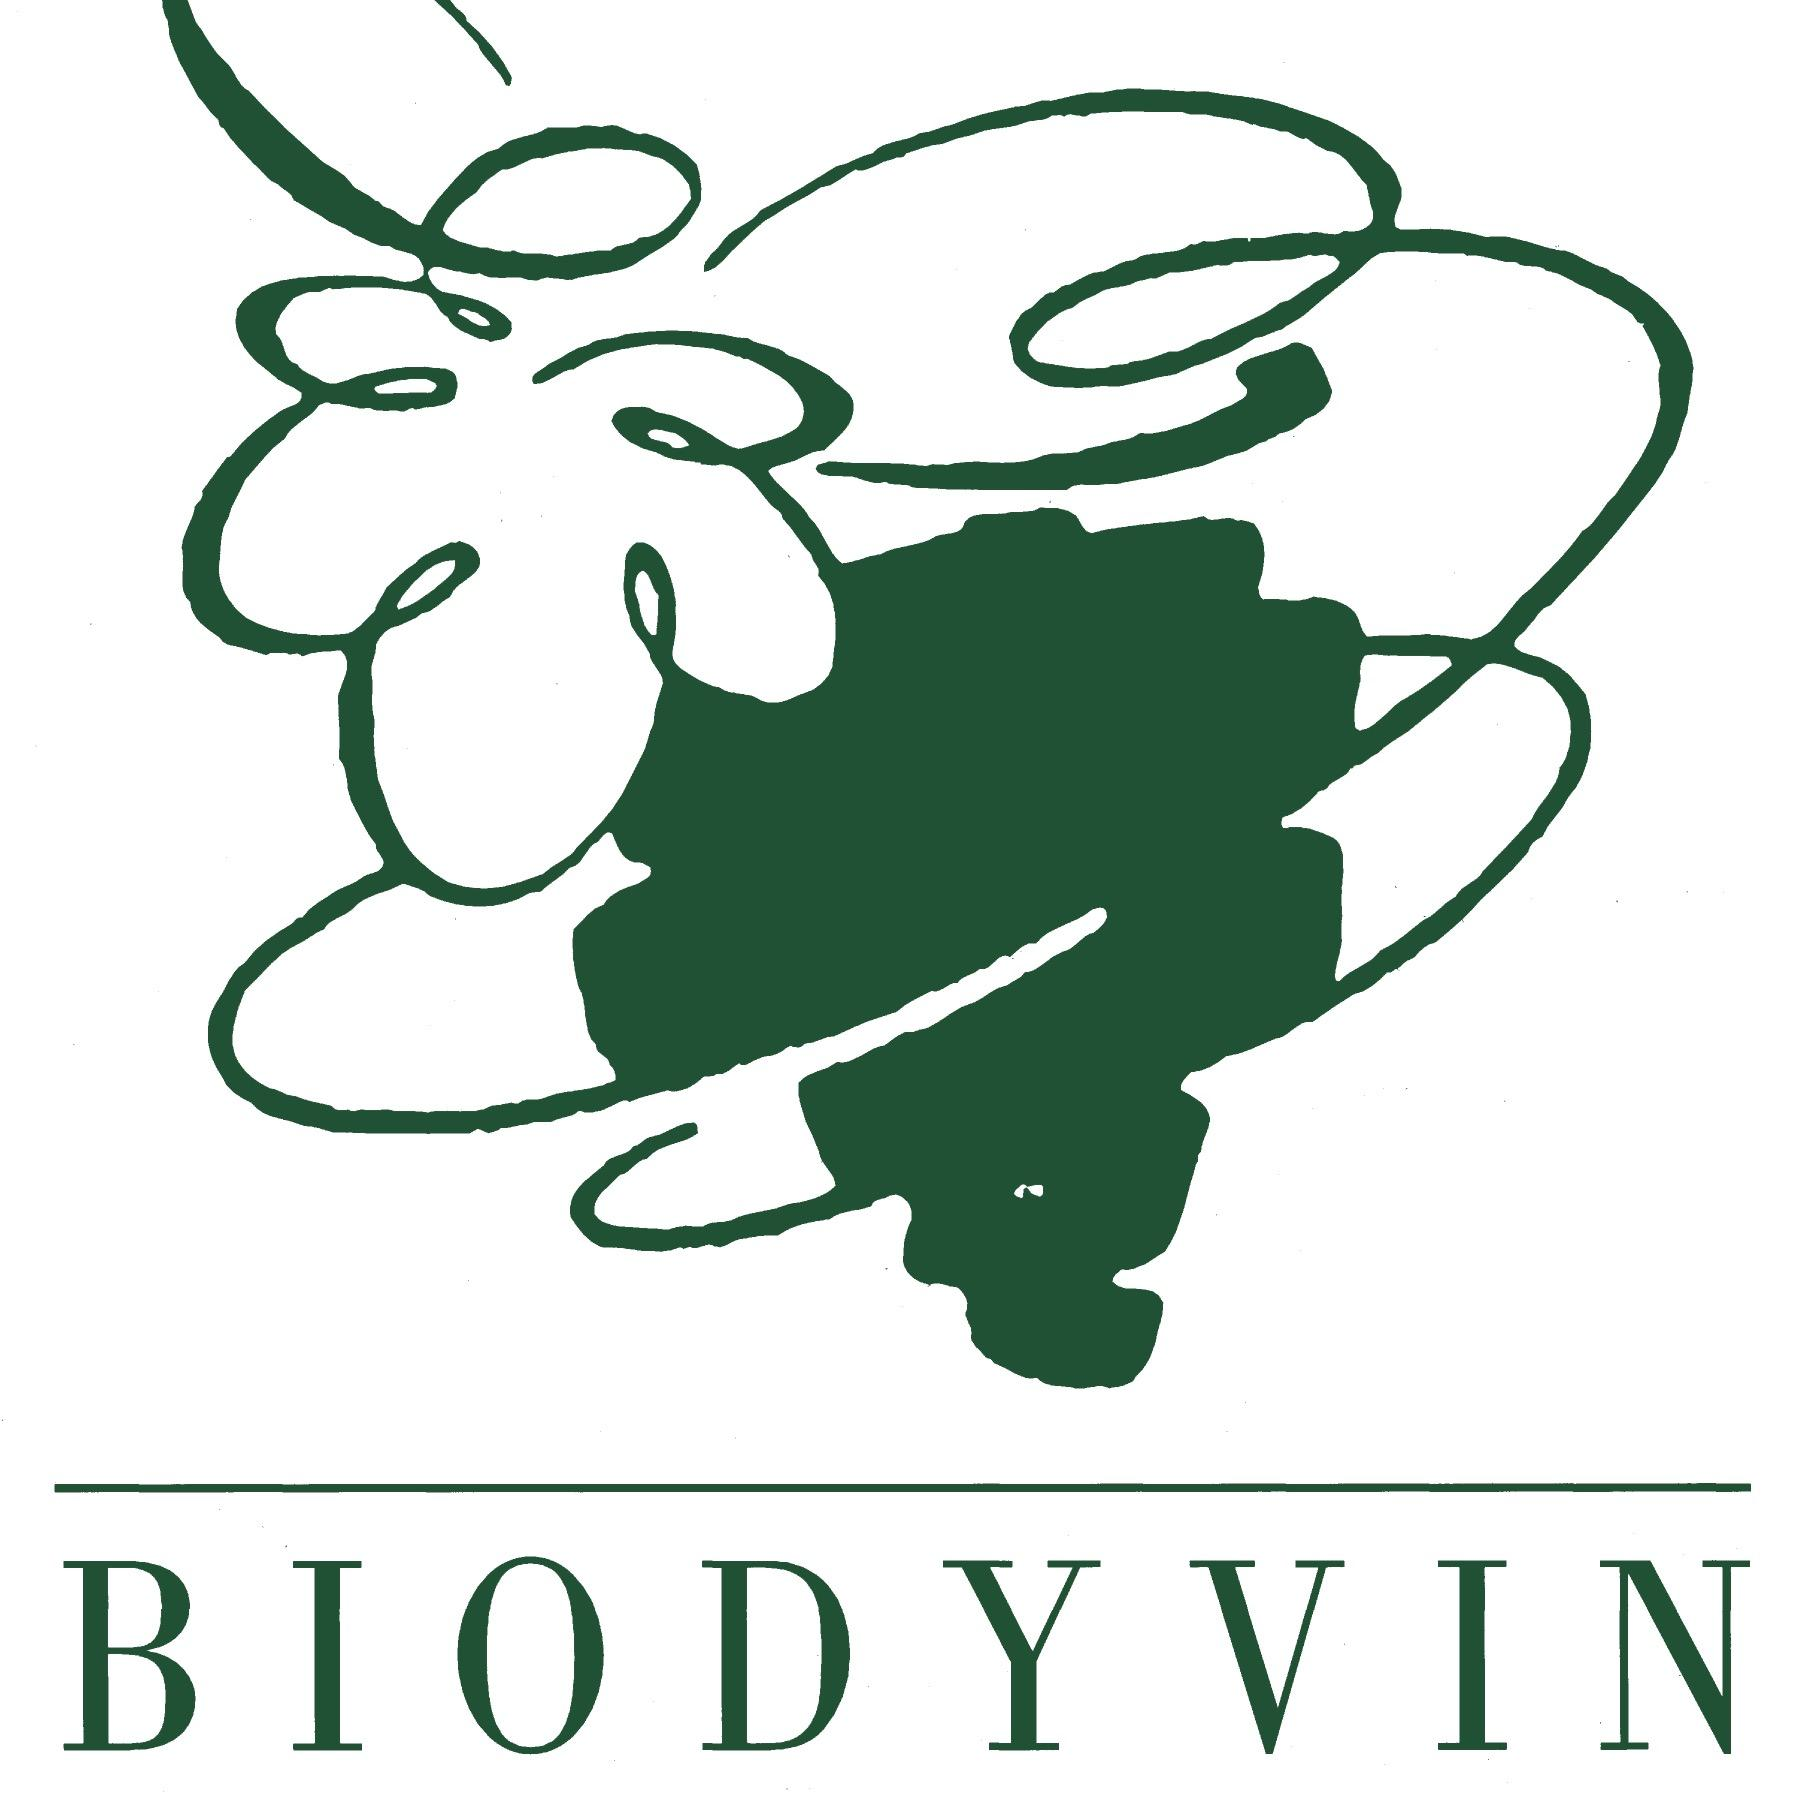 Logo Biodyvin Syndicat International des vignerons en culture bio-dynamie